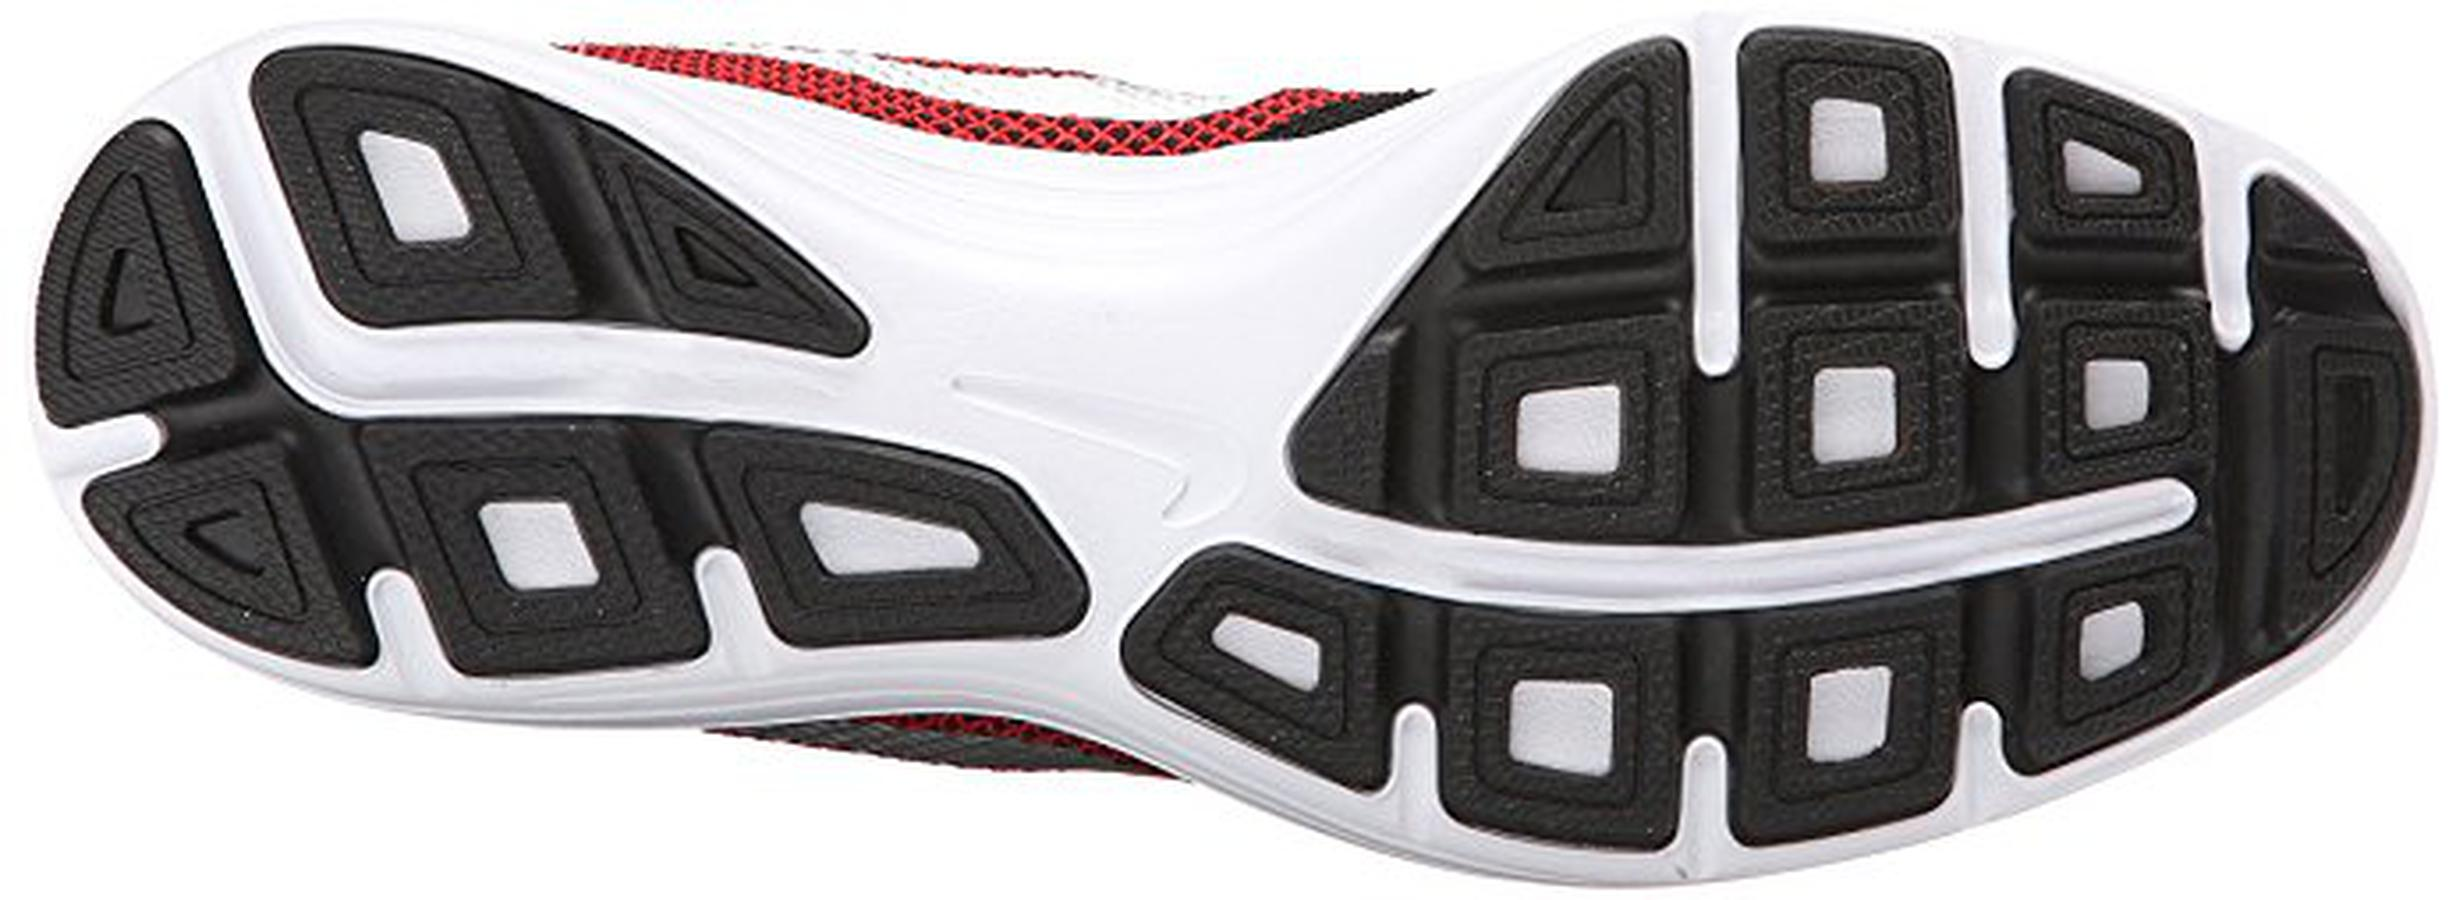 Giày Thể Thao Nam NIKE Revolution 3 Red/Black/White/Silver